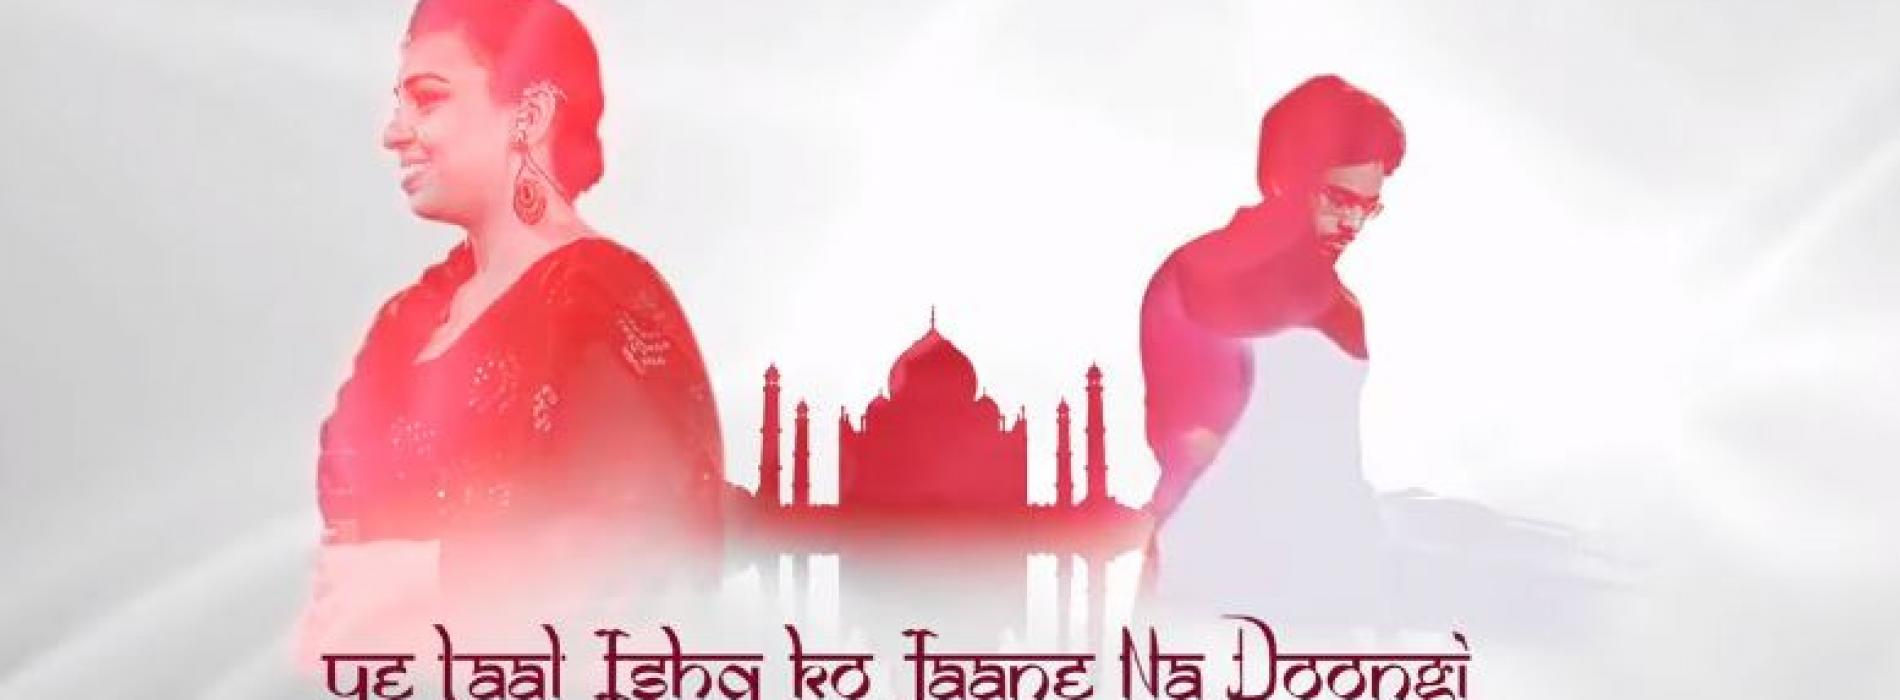 Ye Laal Ishq ko Jaane Na Doongi – Cover by Anu Madhubhashinie Featuring Angelo Gamage